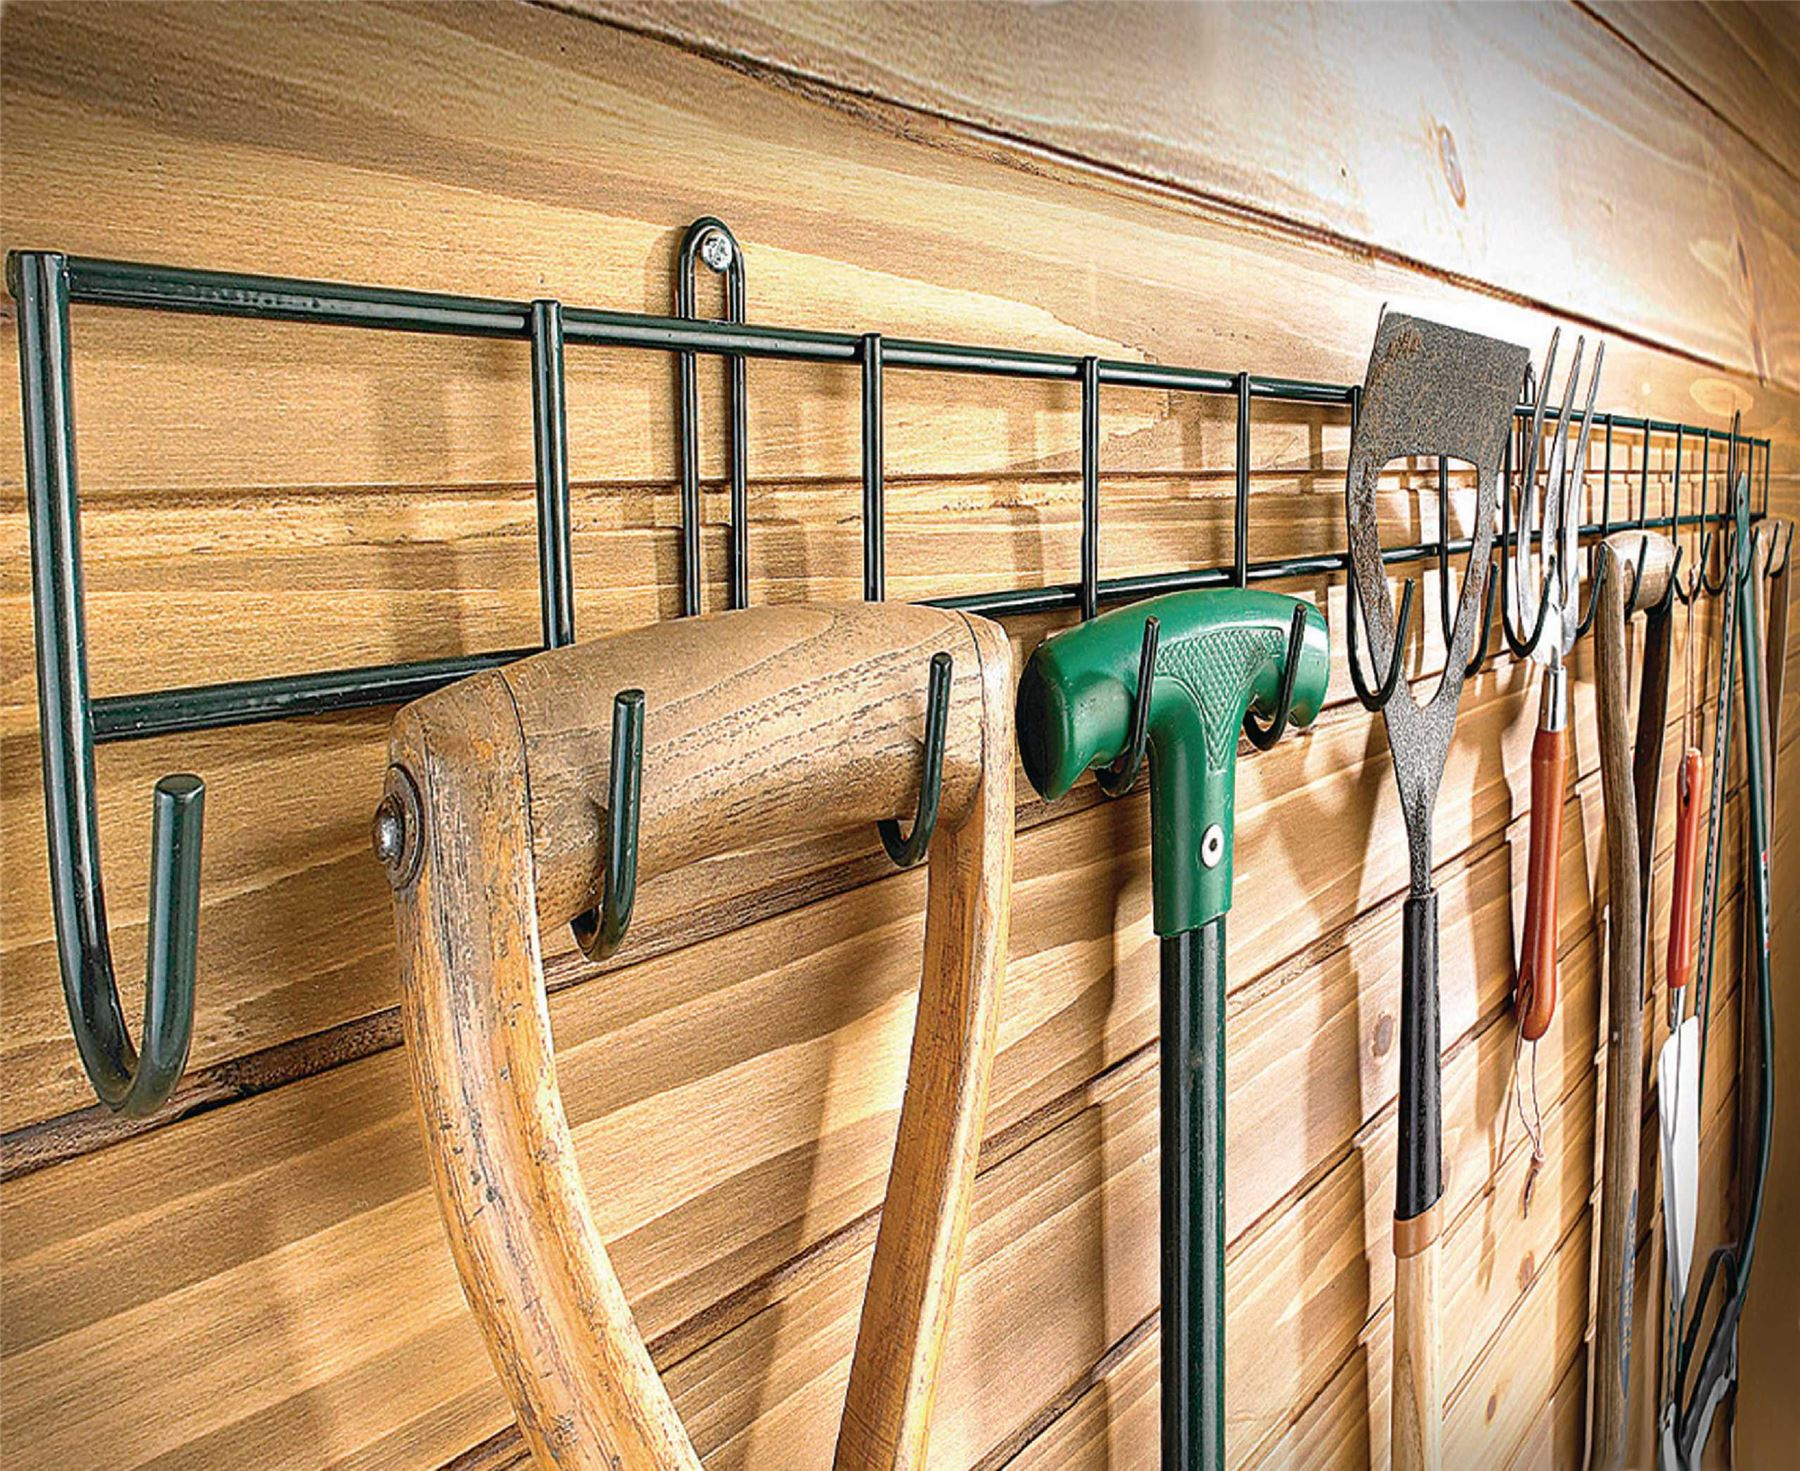 Hanging Rack Garden Tools Holder Wall Storage Metal Organiser 1m ...